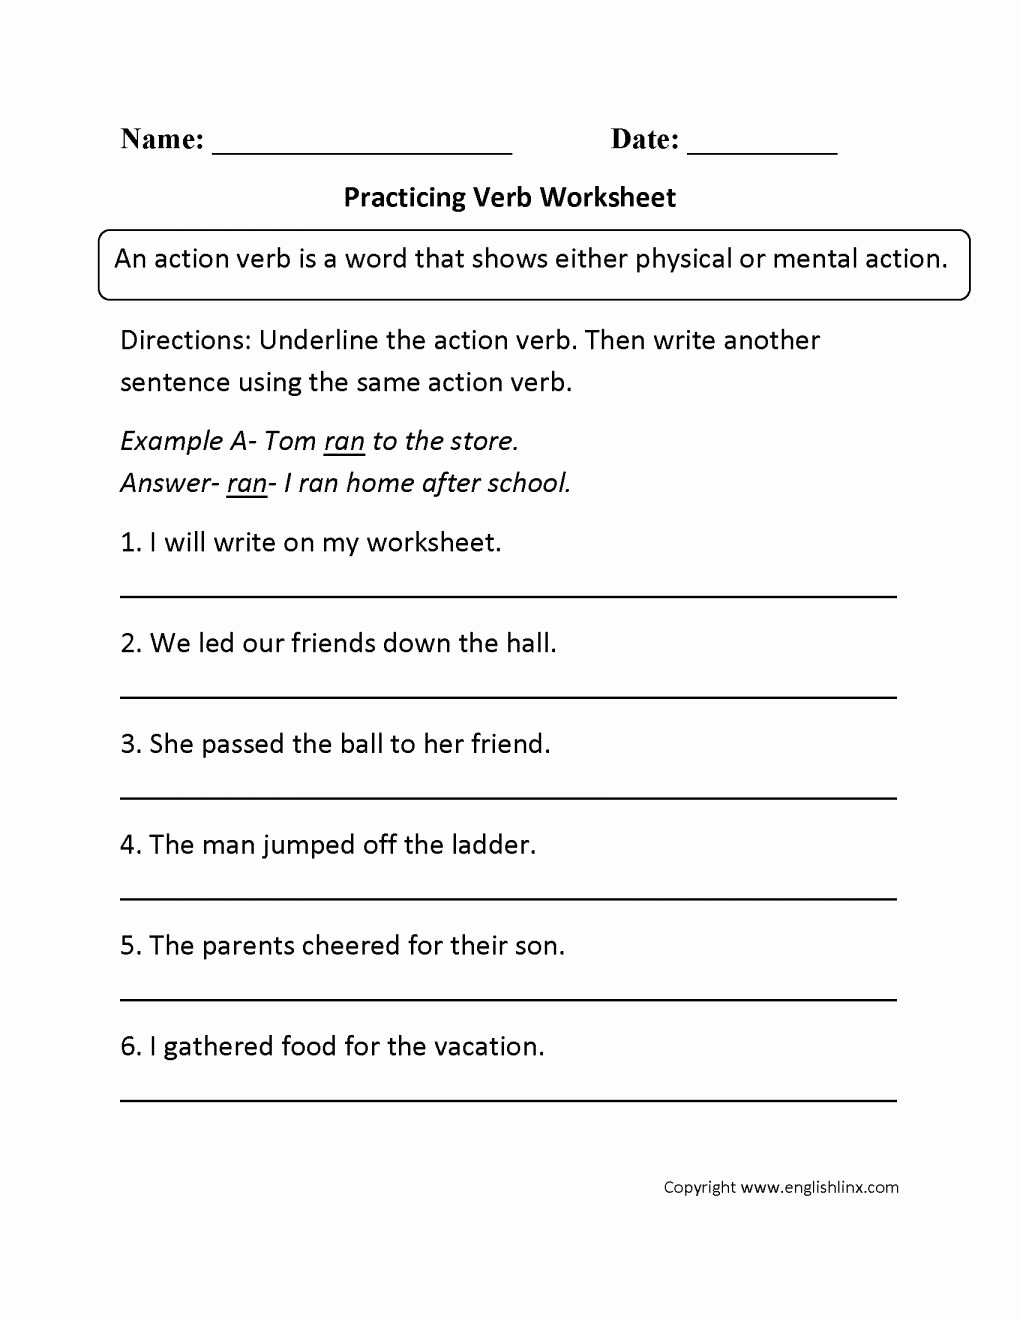 Capitalization Worksheets 4th Grade Pdf New 20 Capitalization Worksheets 4th Grade Pdf